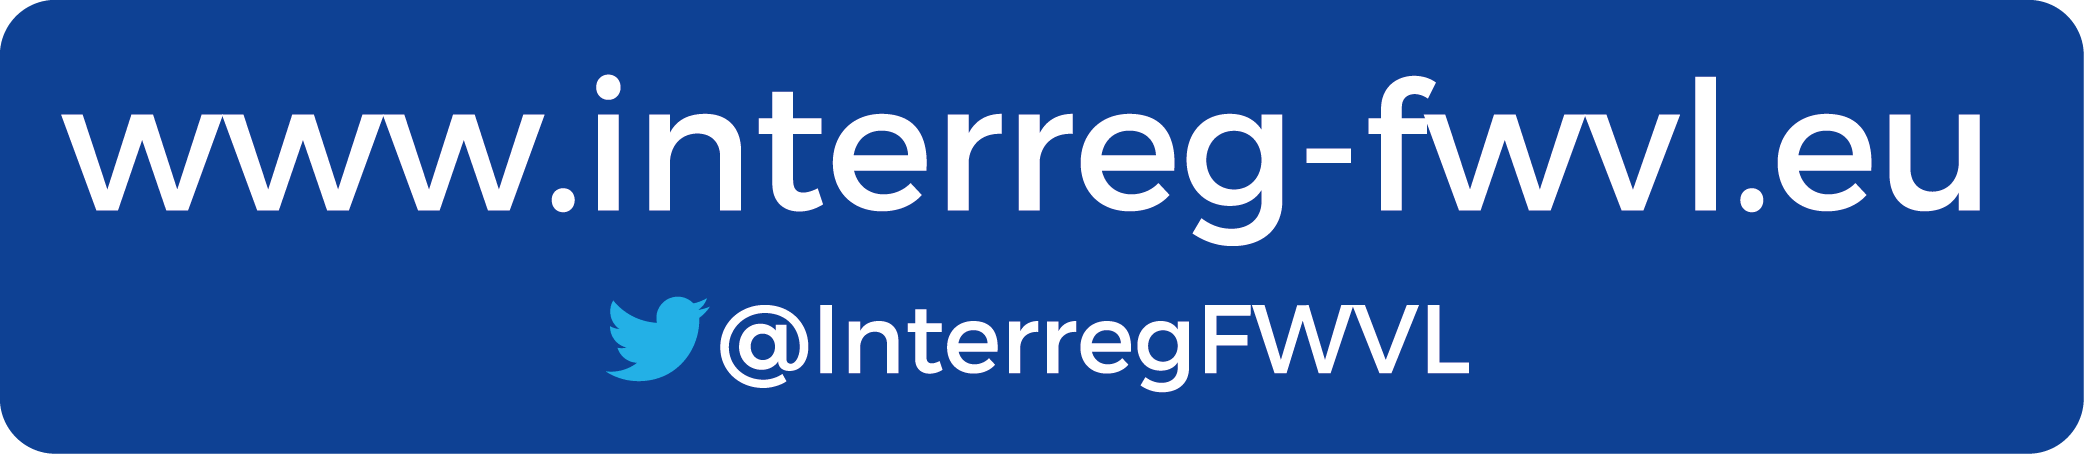 interreg-fwvl